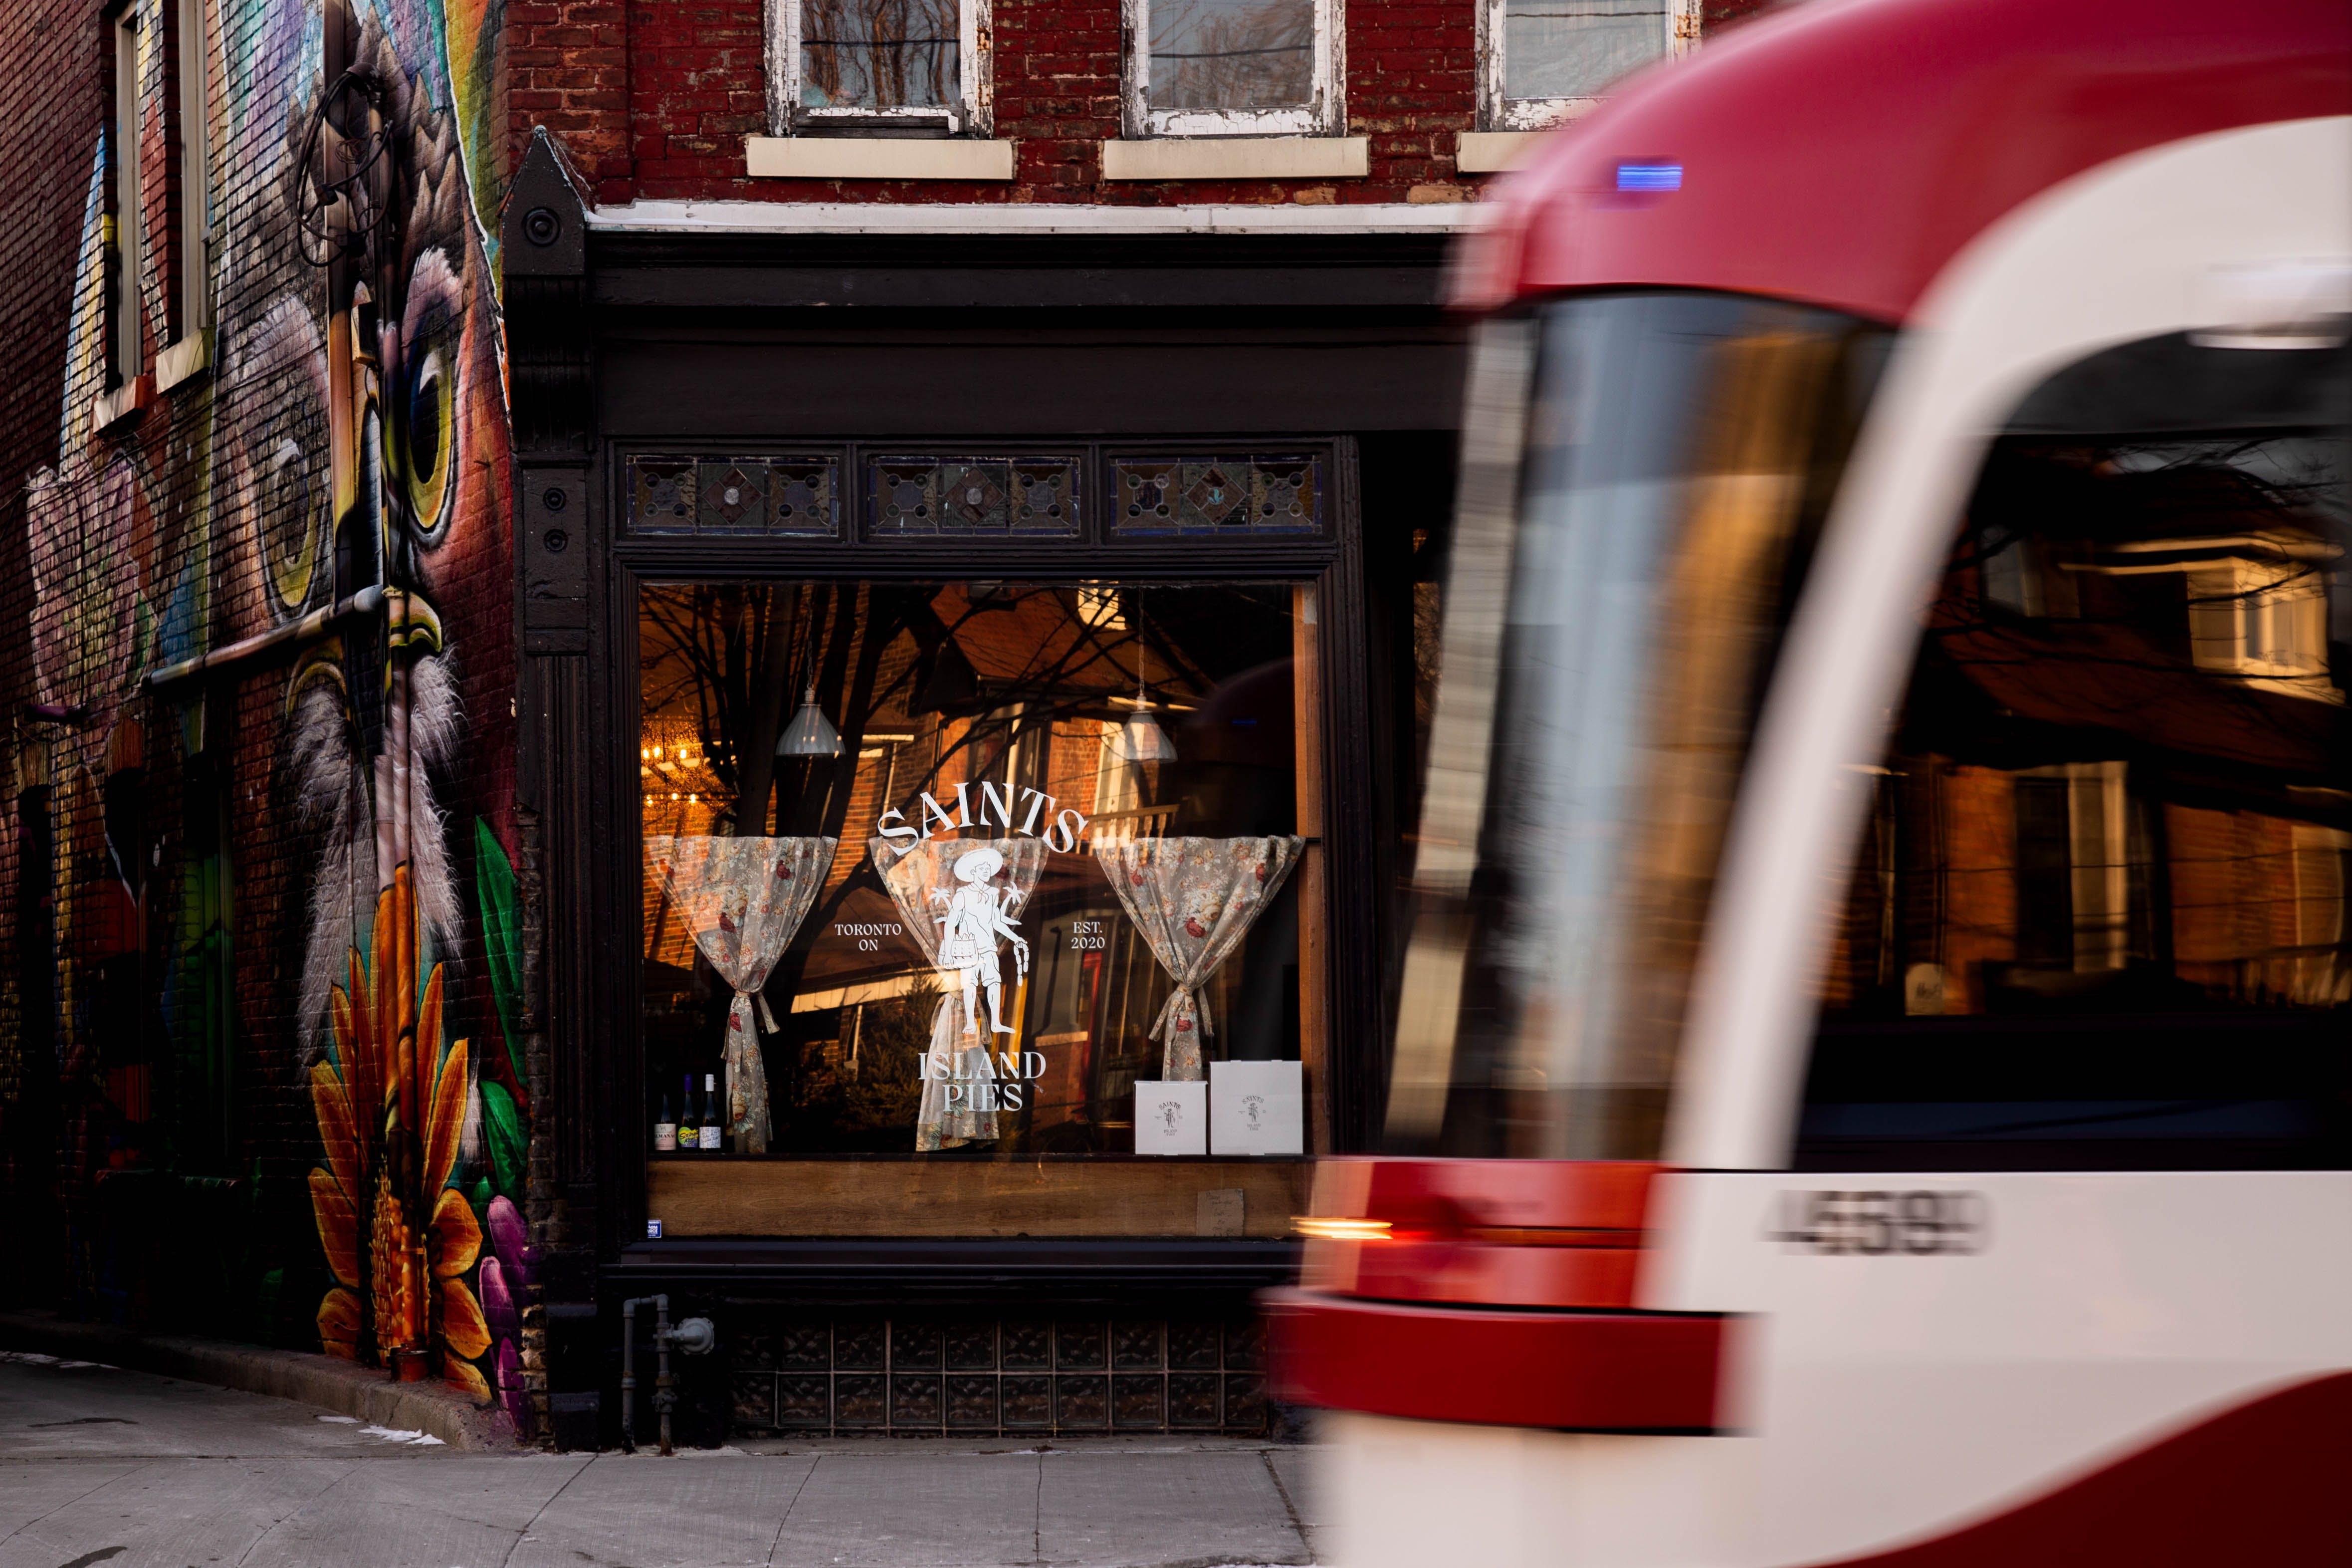 A TTC streetcar passes by Saints Island Pies restaurant on Dundas Street West in Toronto.